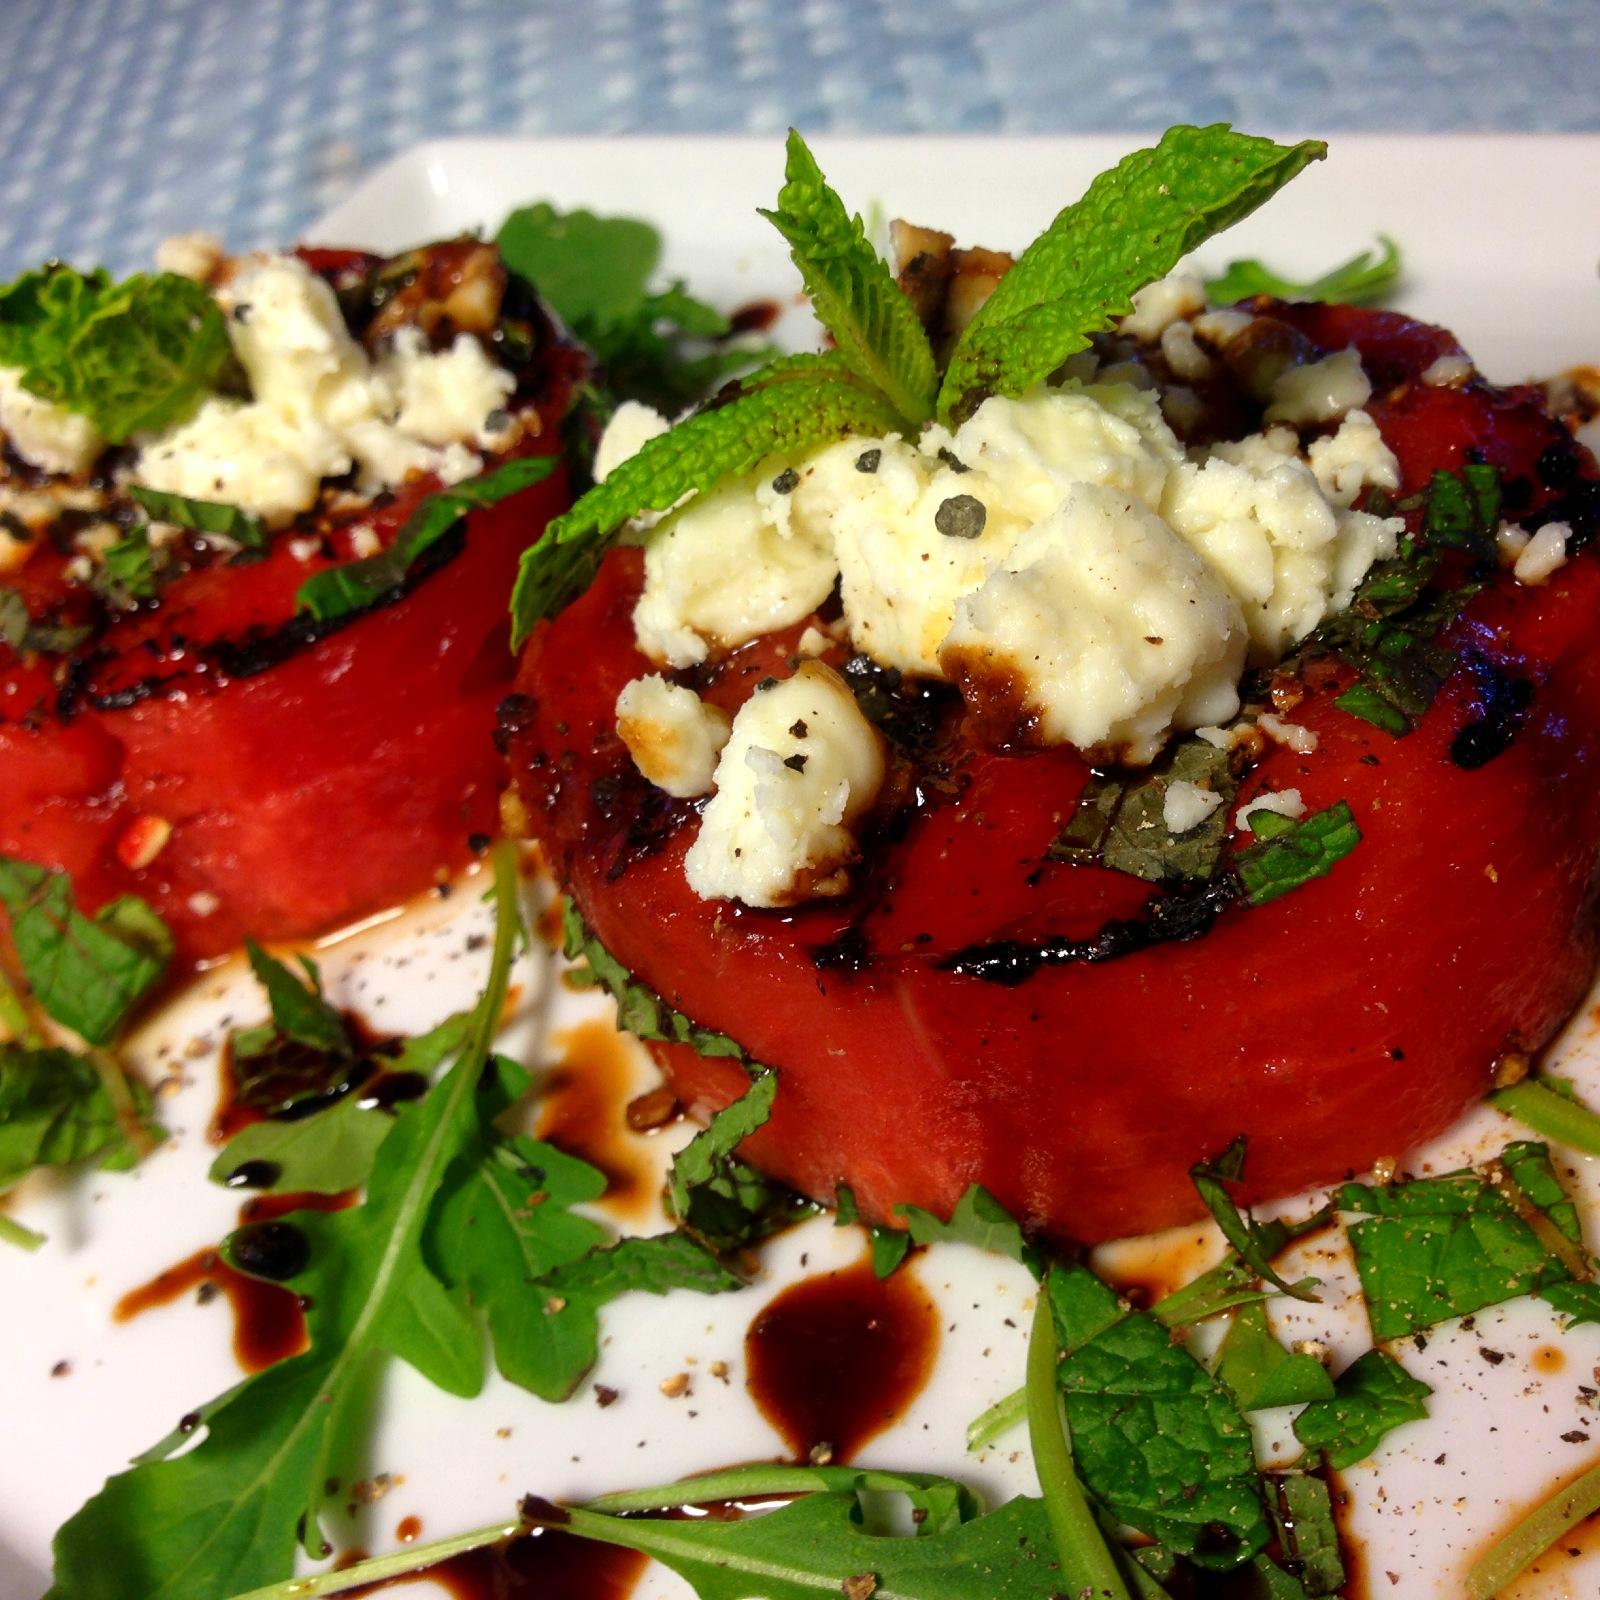 Grilled Watermelon & Feta Salad With Mint, Arugula